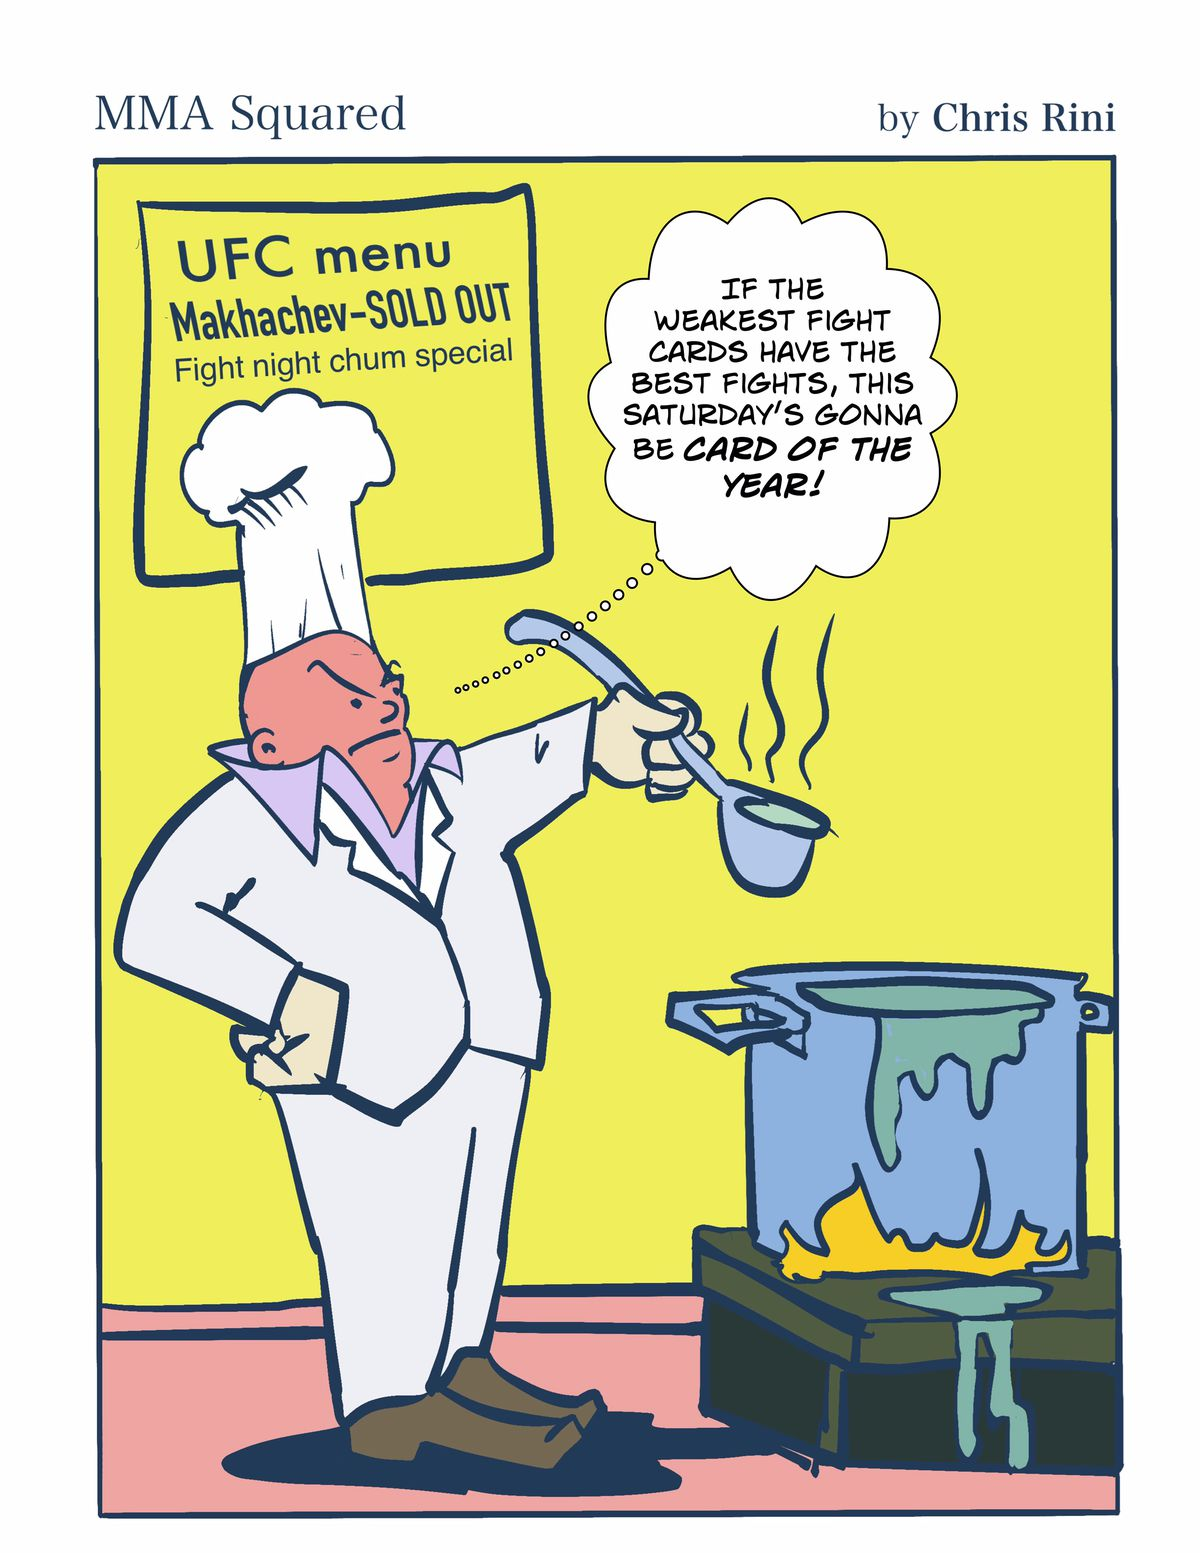 Chris Rini, MMA Squared, UFC, Main Event, Dana White, UFC Booking, UFC Possible Next Fights, UFC Vegas, UFC APEX, UFC Vegas 14, Rafael dos Anjos, Michael Chandler, Islam Makhachev,